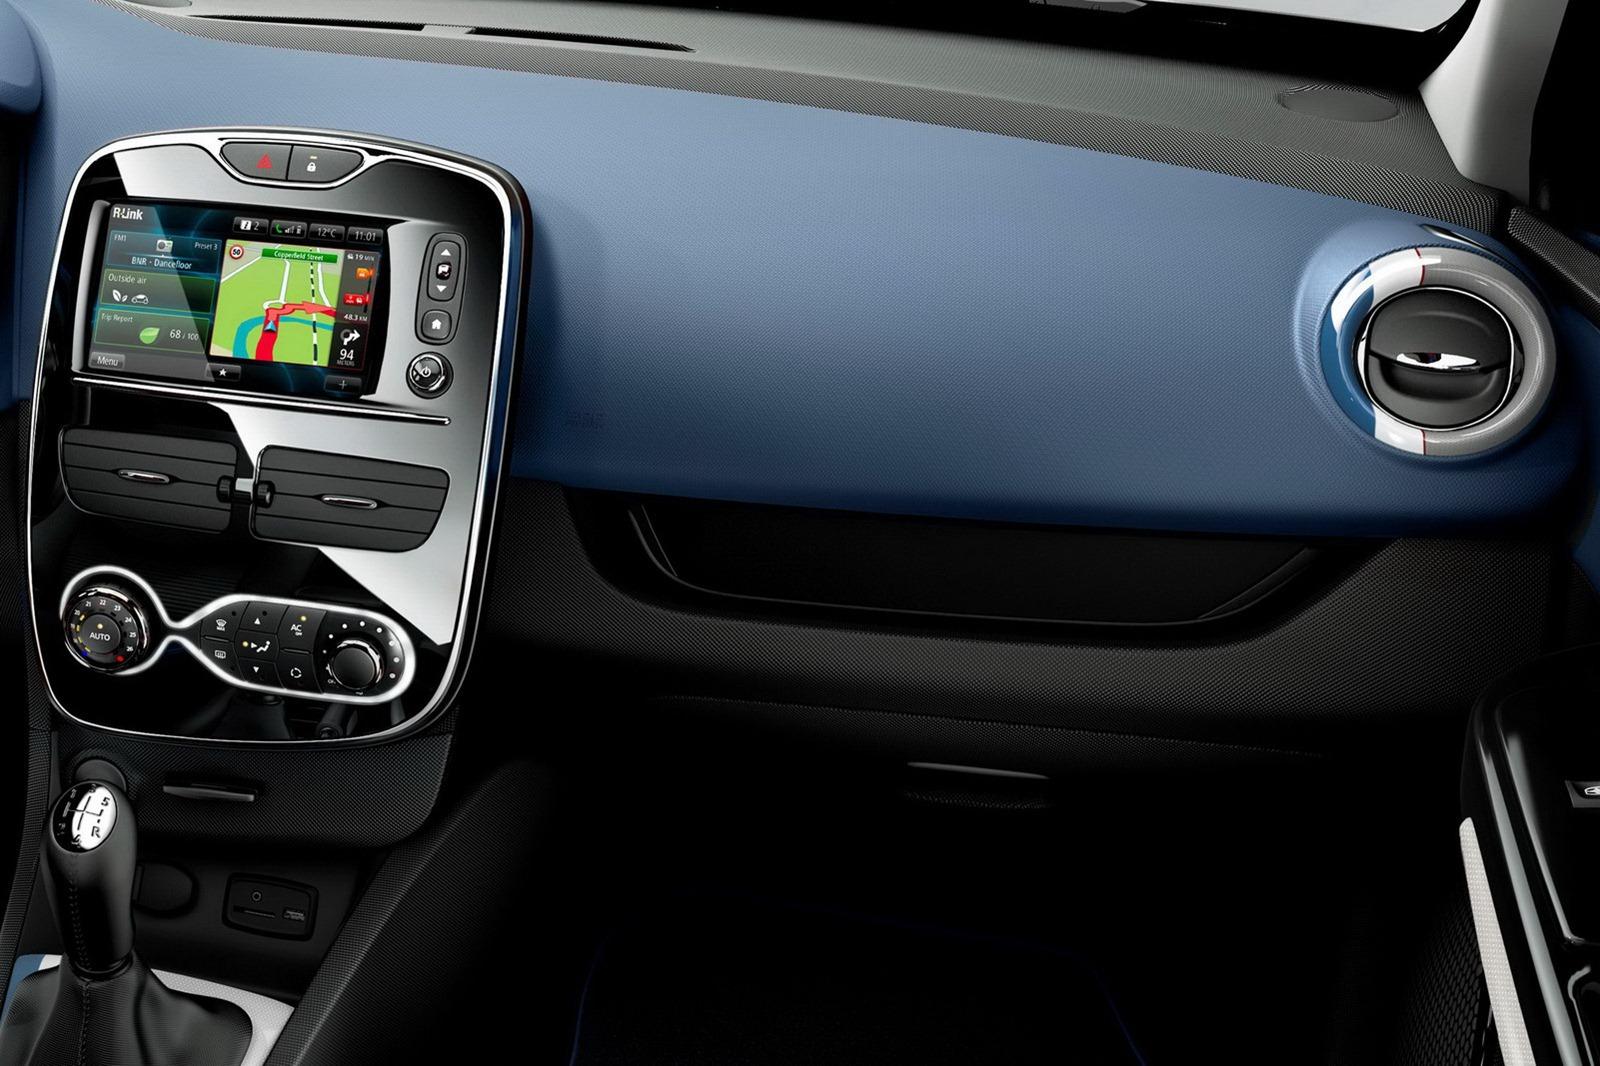 Renault Clio 2013 nuove immagini